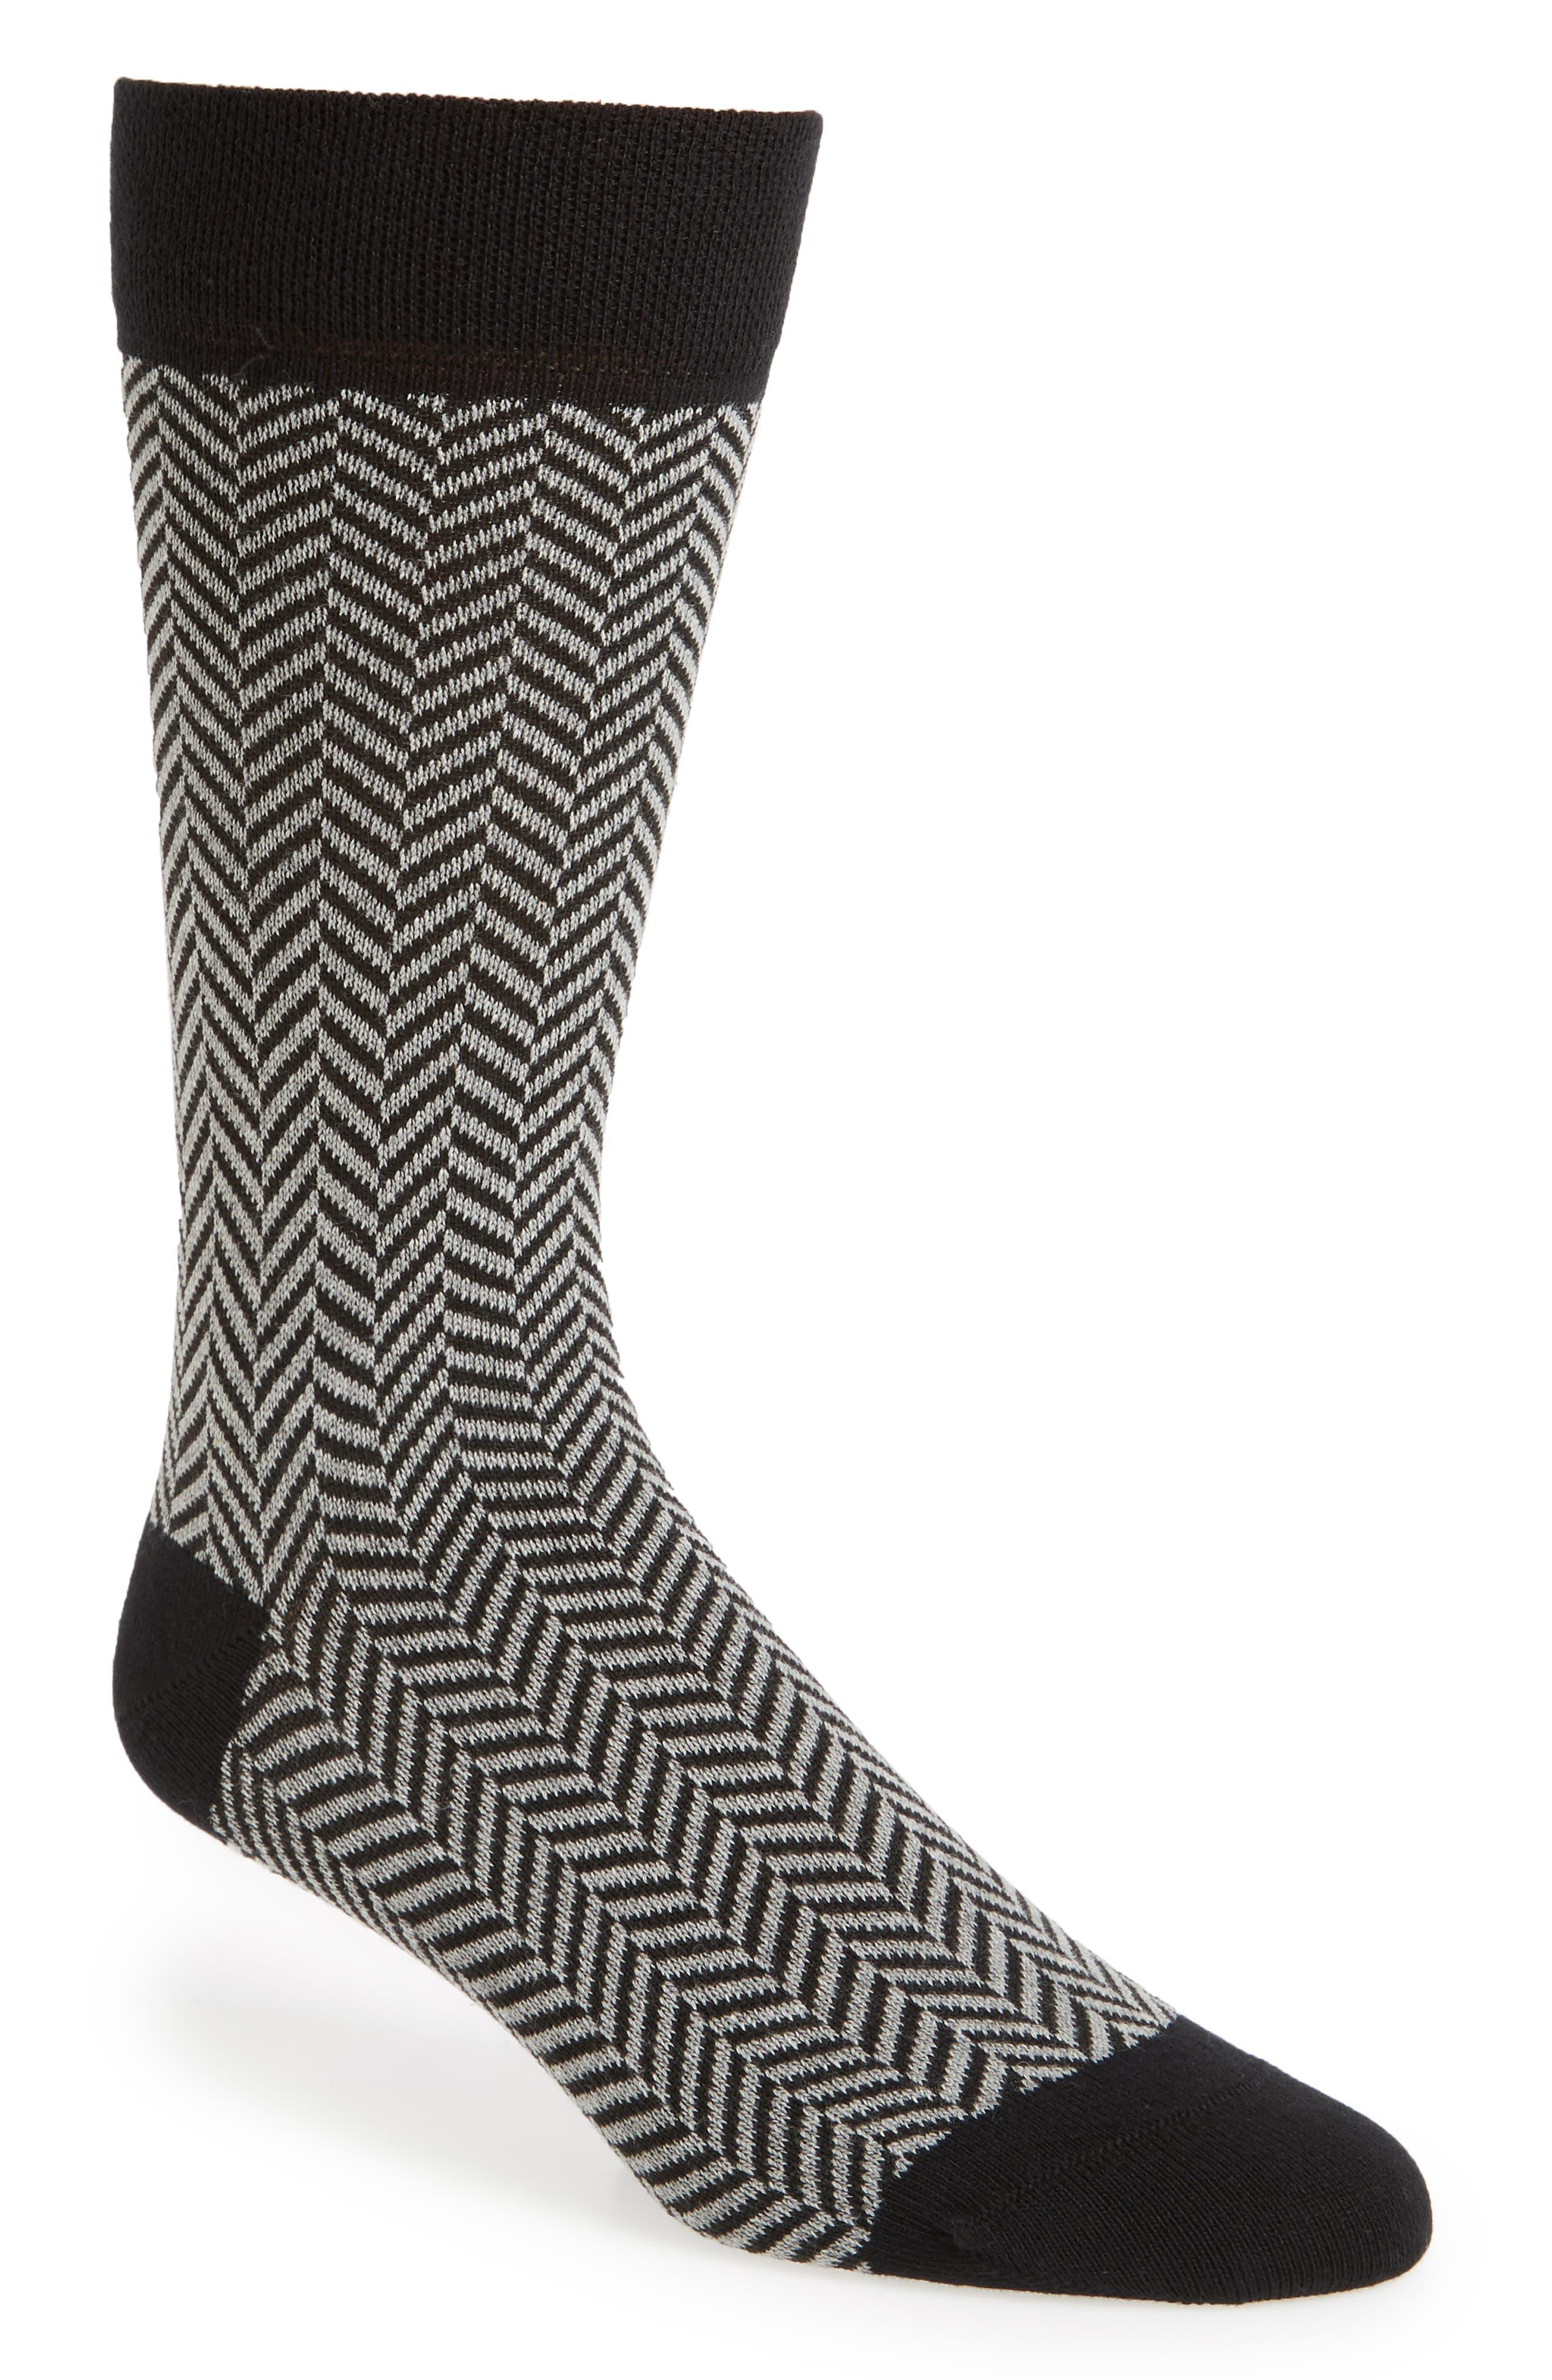 Ronimow Herringbone Socks,                             Main thumbnail 1, color,                             001